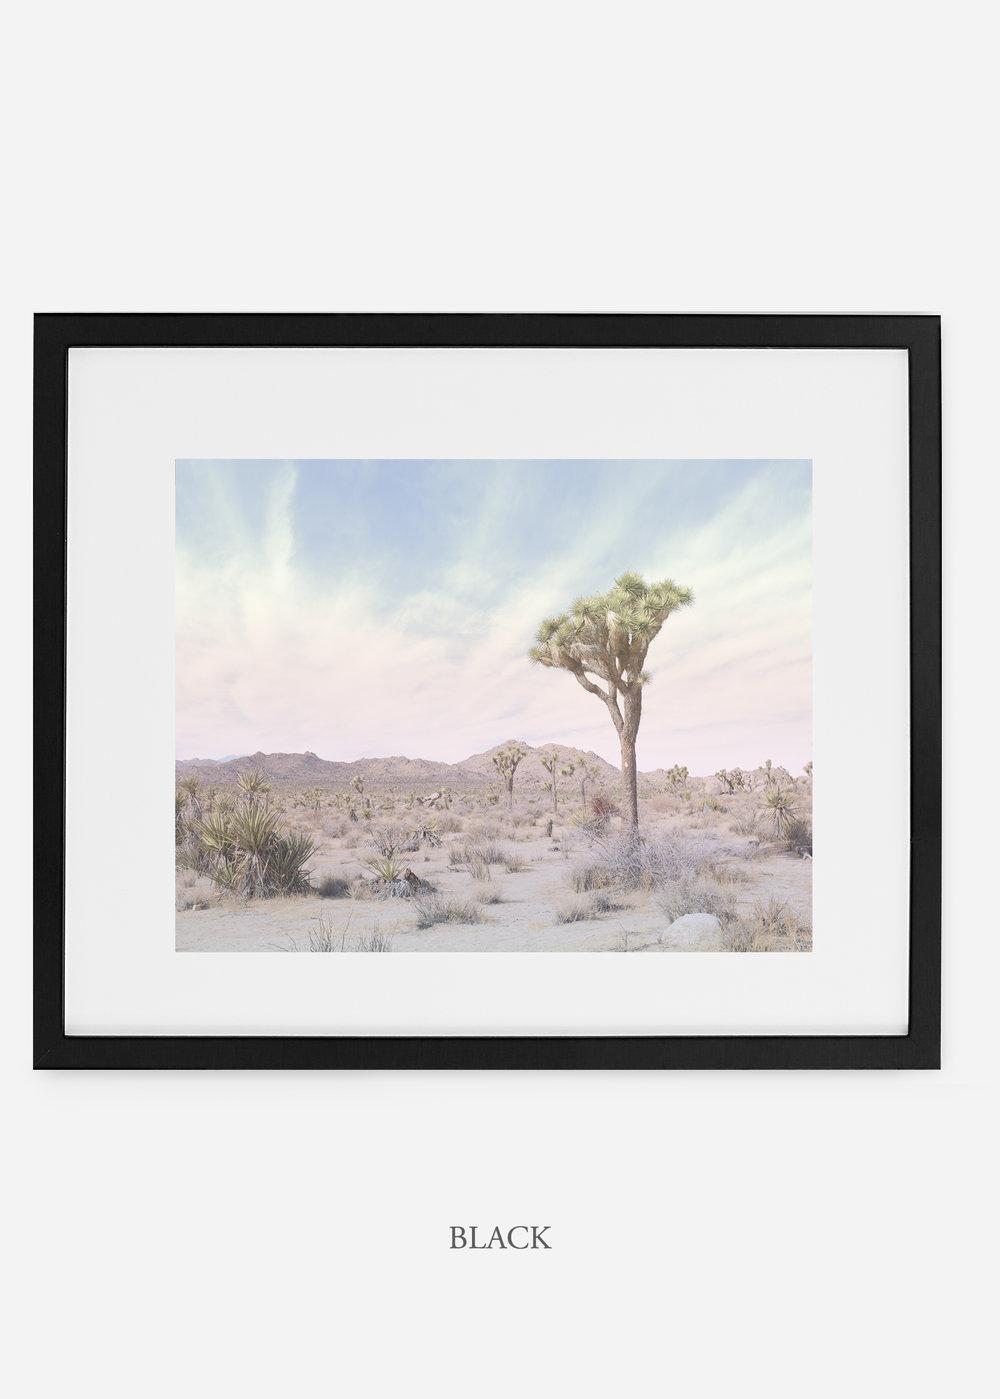 WilderCalifornia_black_JoshuaTree_No.13_interiordesign_prints_art.jpg